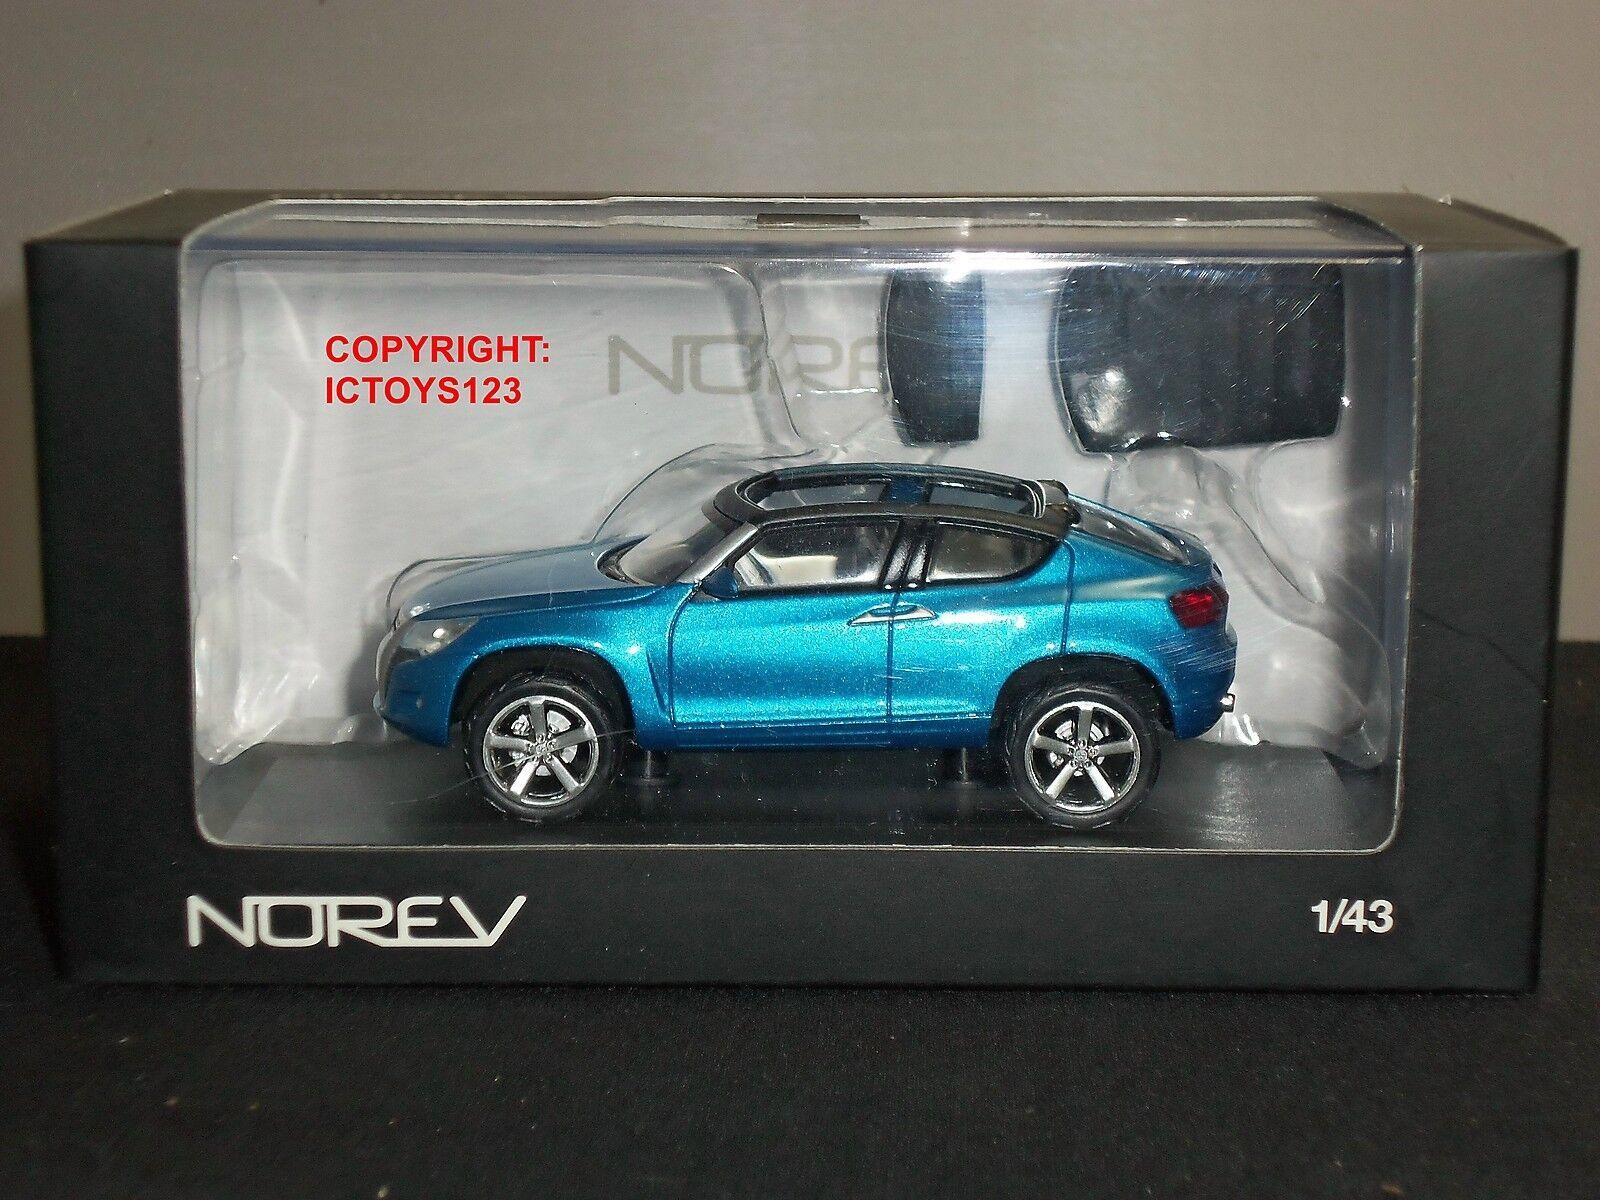 NOREV 840108 VOLKSWAGEN VW CONCEPT A blueE DIECAST MODEL CAR